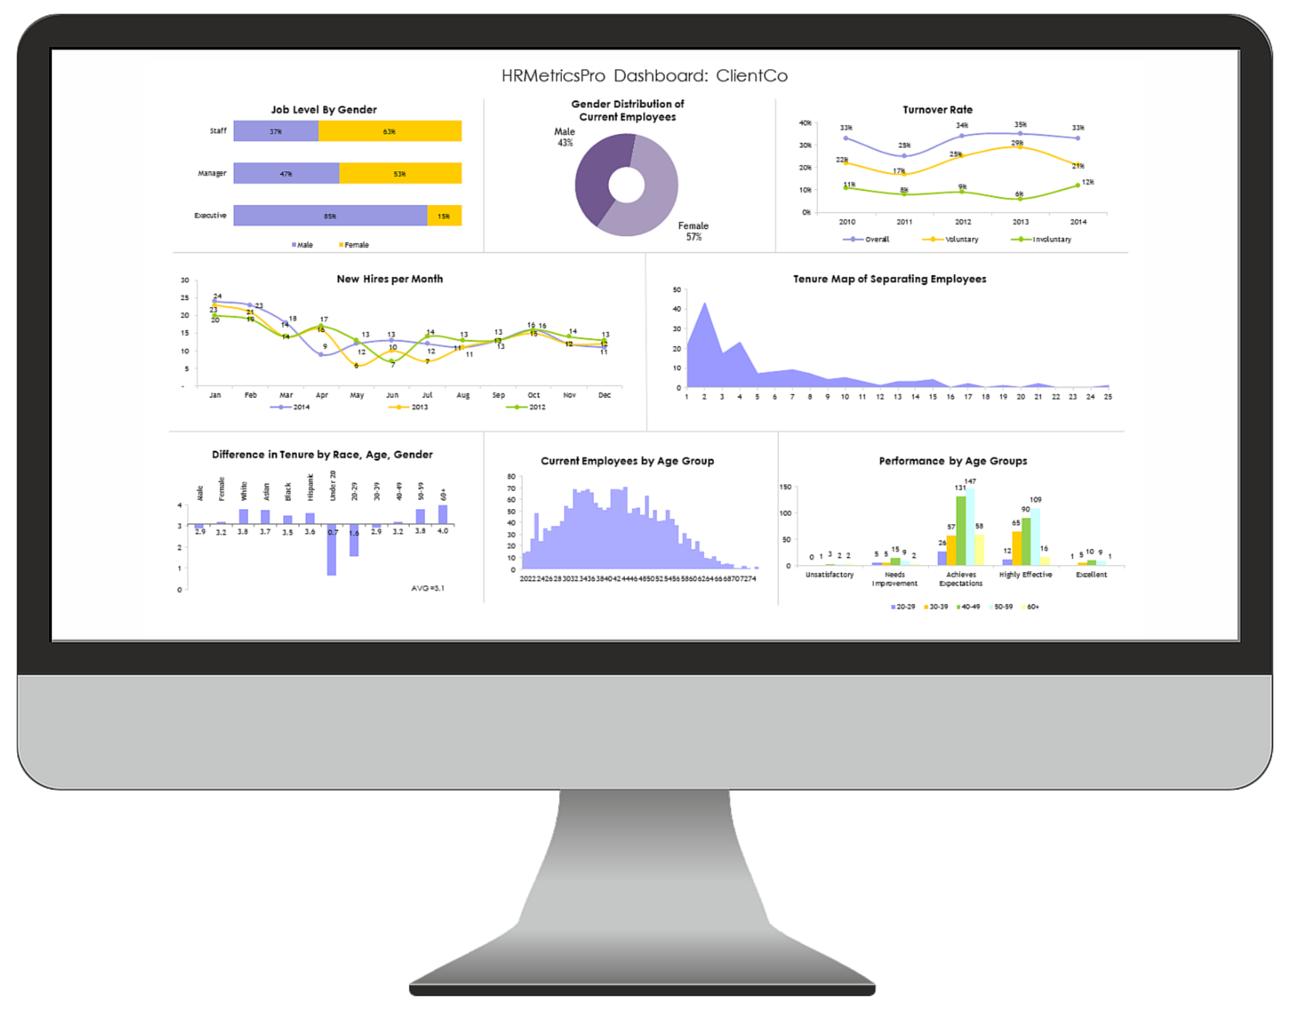 HRMetricsPro Homepage Image (FINAL)